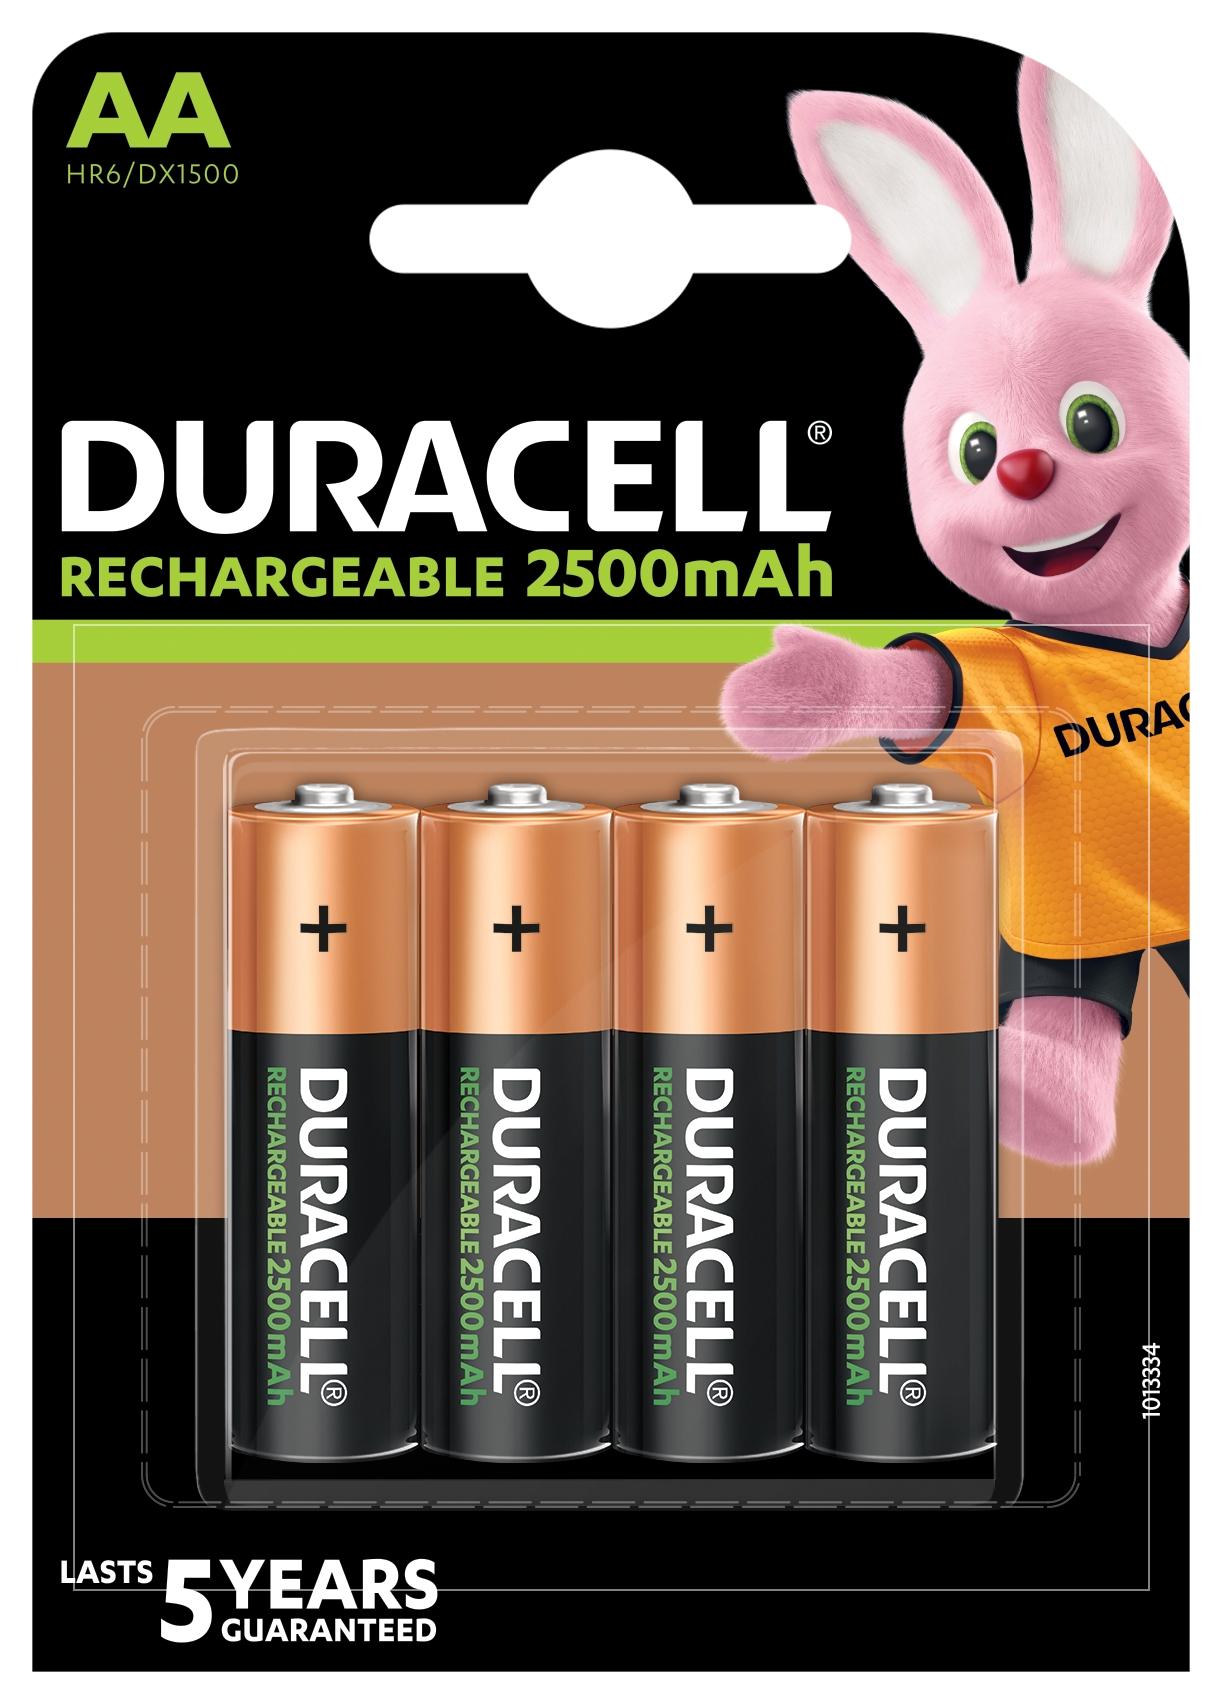 Baterie AA/HR6 2500mAh DURACELL RECHARGEABLE, 4 ks (blistr)